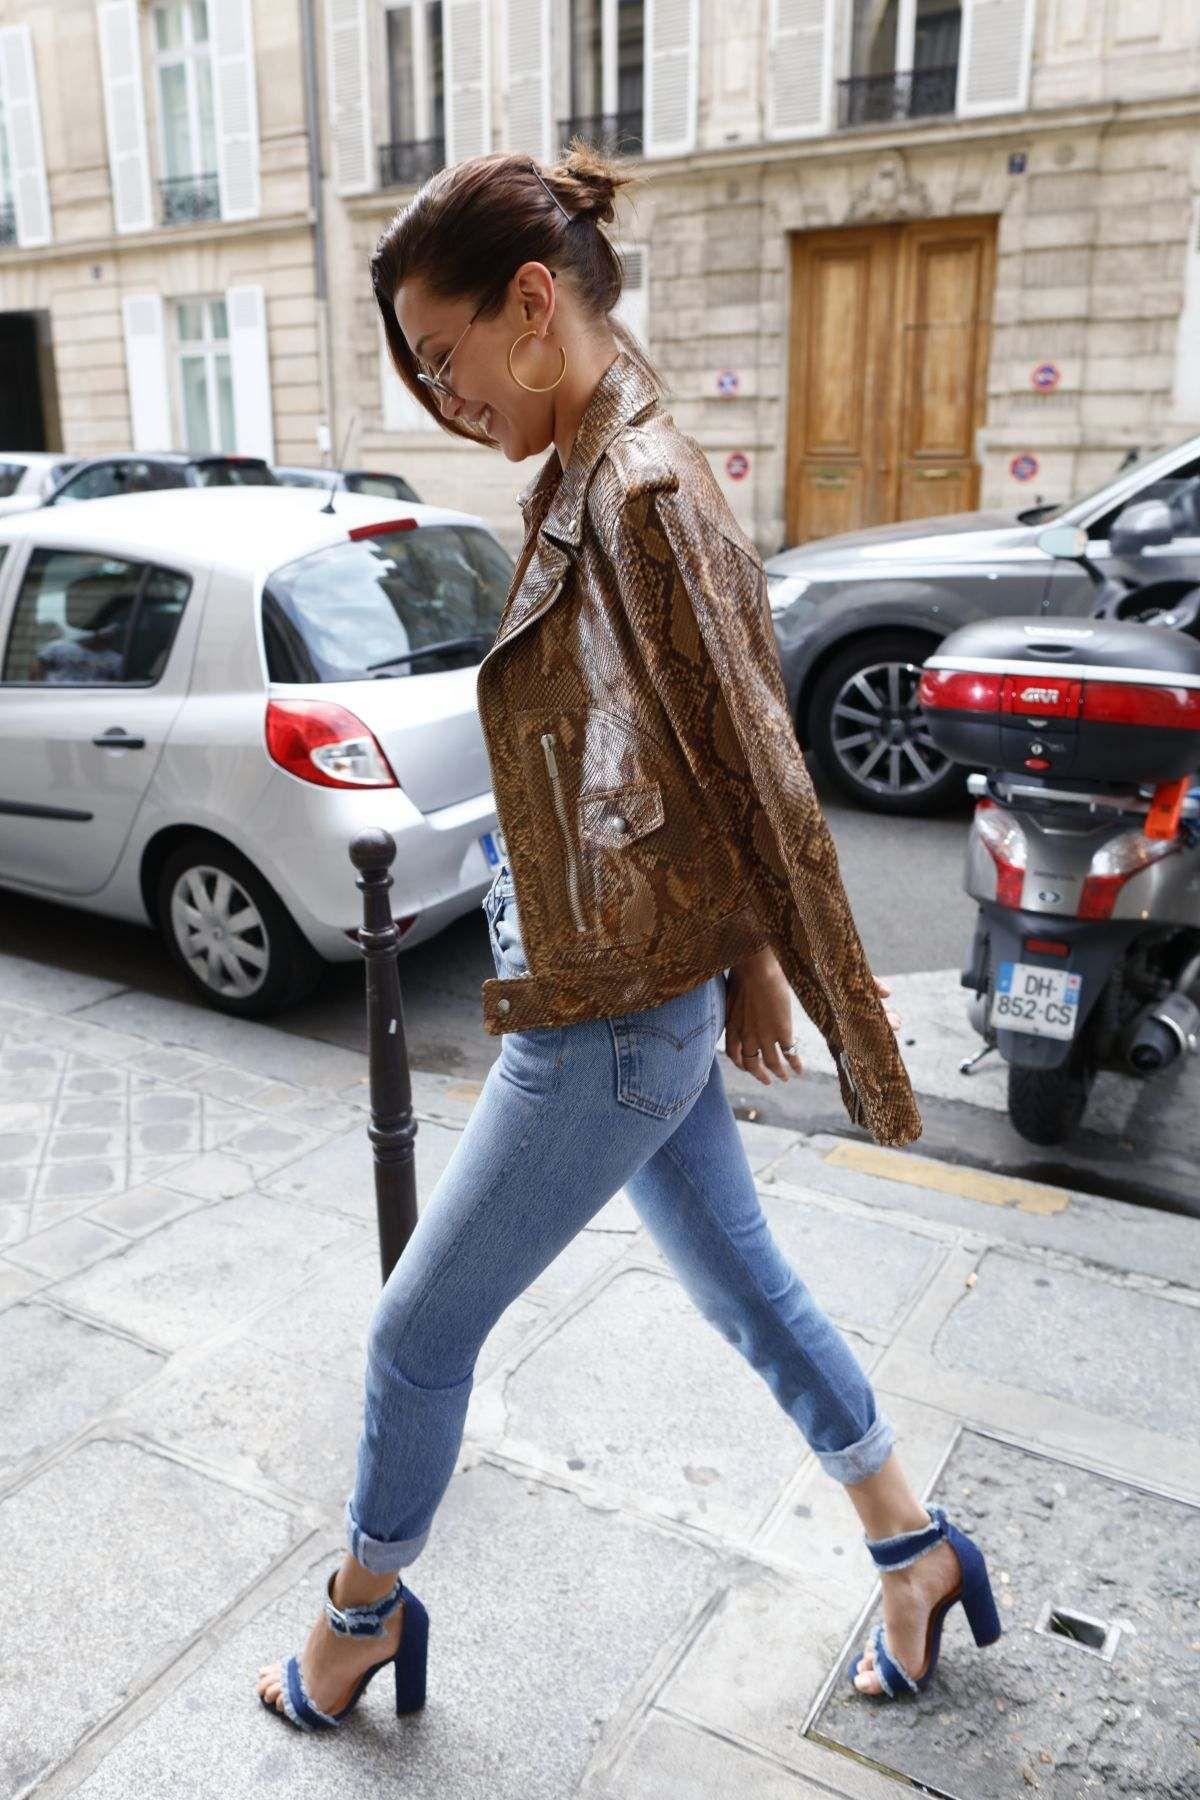 Bella Hadid In Skinny Jeans Out In Paris  0c2fa8b5ff